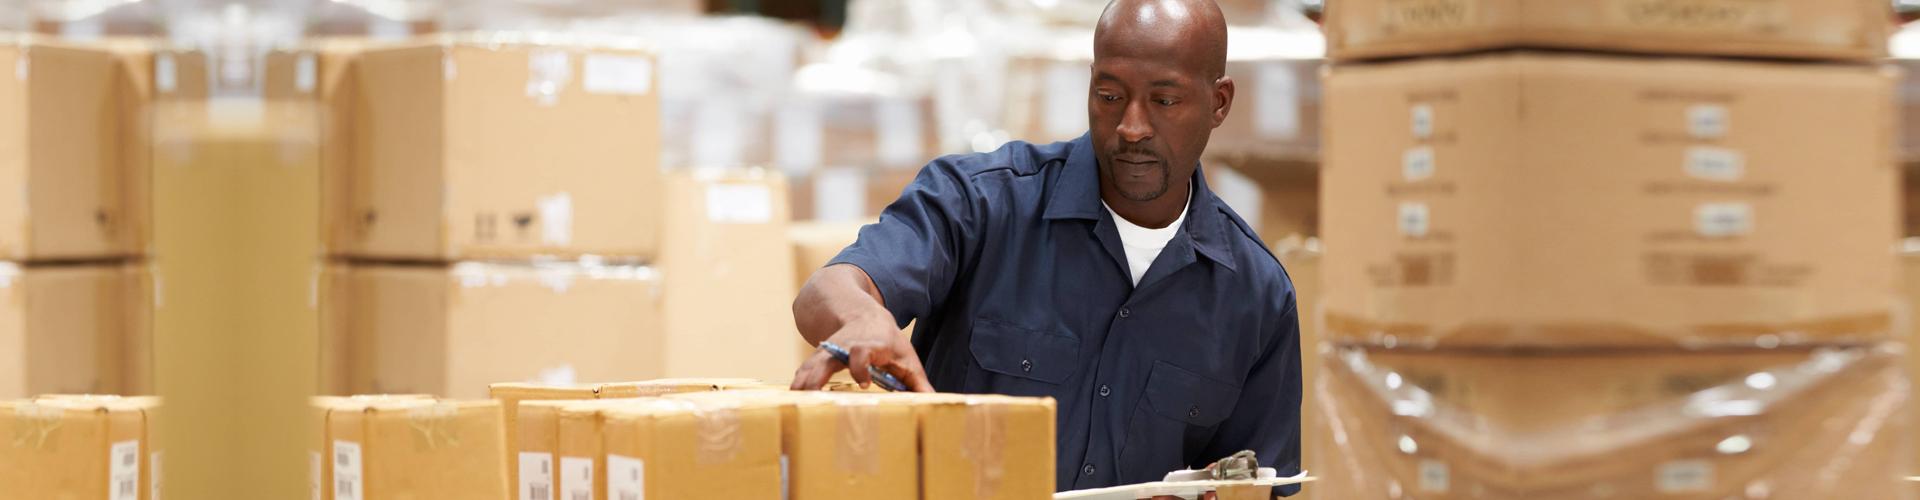 man sorting packages